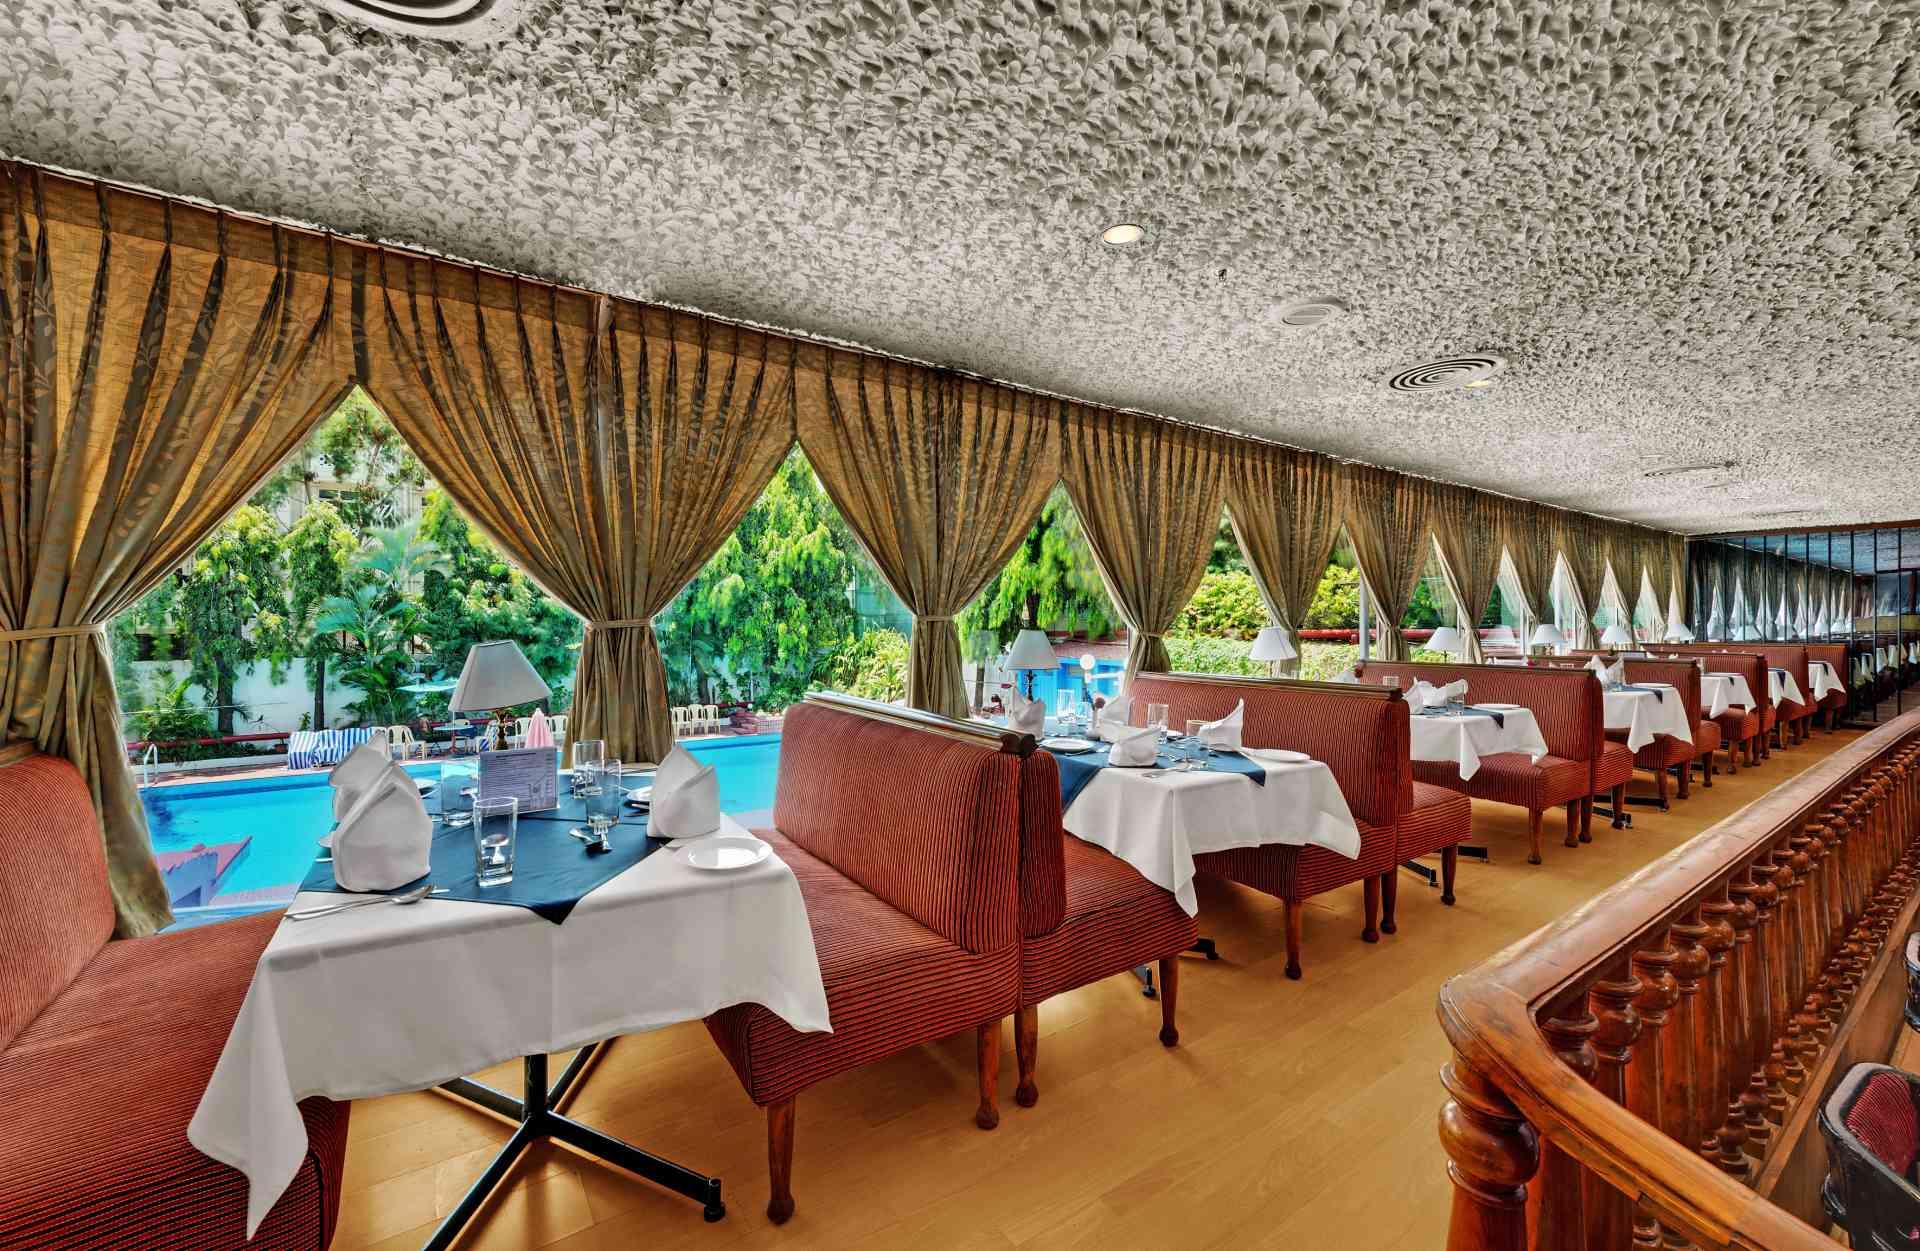 Chennai The Society Restaurant Pool View Ambassador Palava - The Ambassador | Heritage Hotels in Mumbai, Aurangabad, Chennai - Ambassador Pallava Chennai